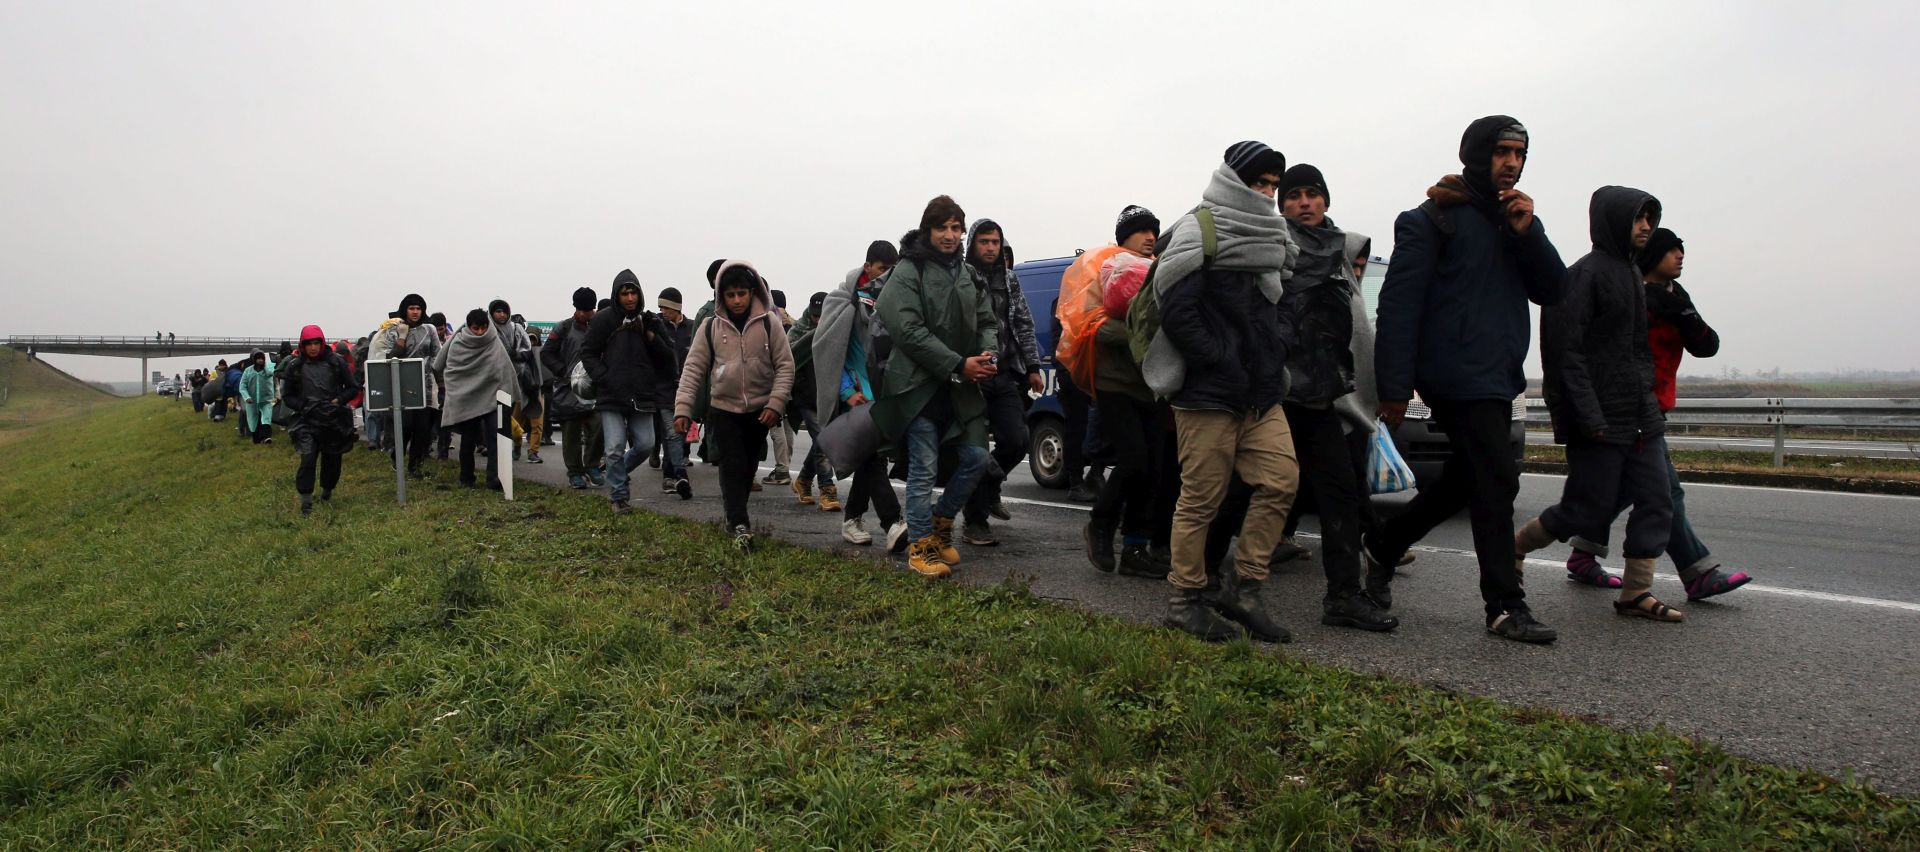 EU si dao rok do lipnja za dogovor o izbjeglicama